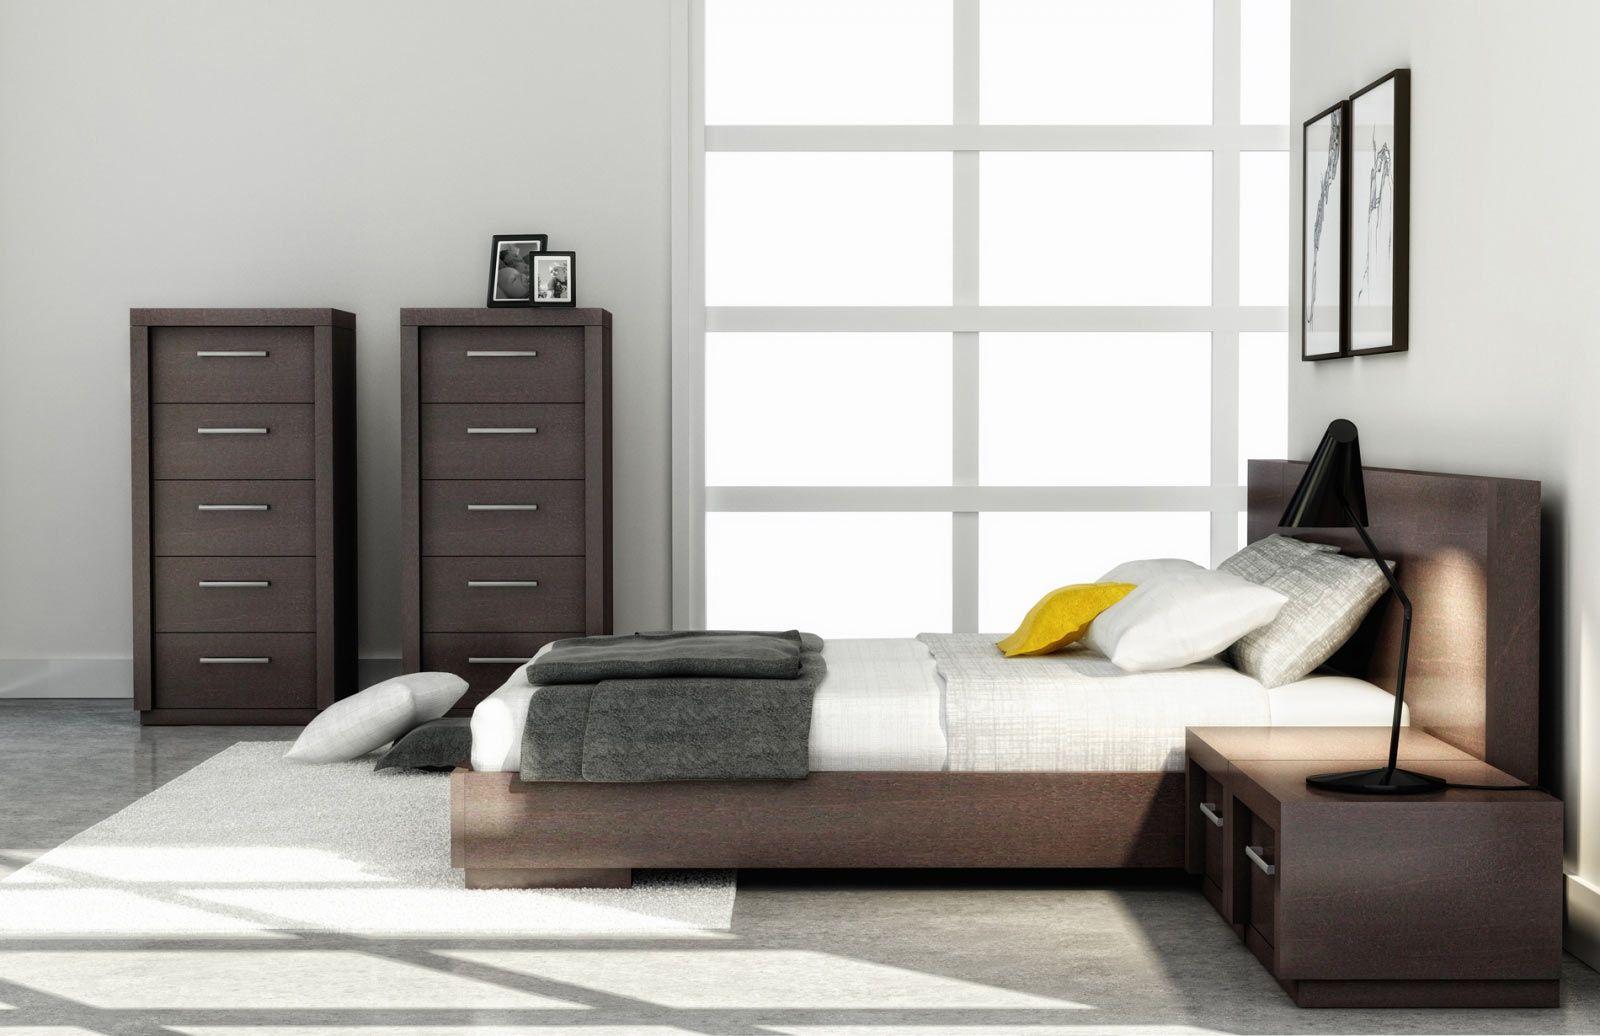 Huppe Amelia Extended Headboard Wood Bed   Modern Bedroom ... - Huppe Amelia Extended Headboard Wood Bed   Modern Bedroom Furniture